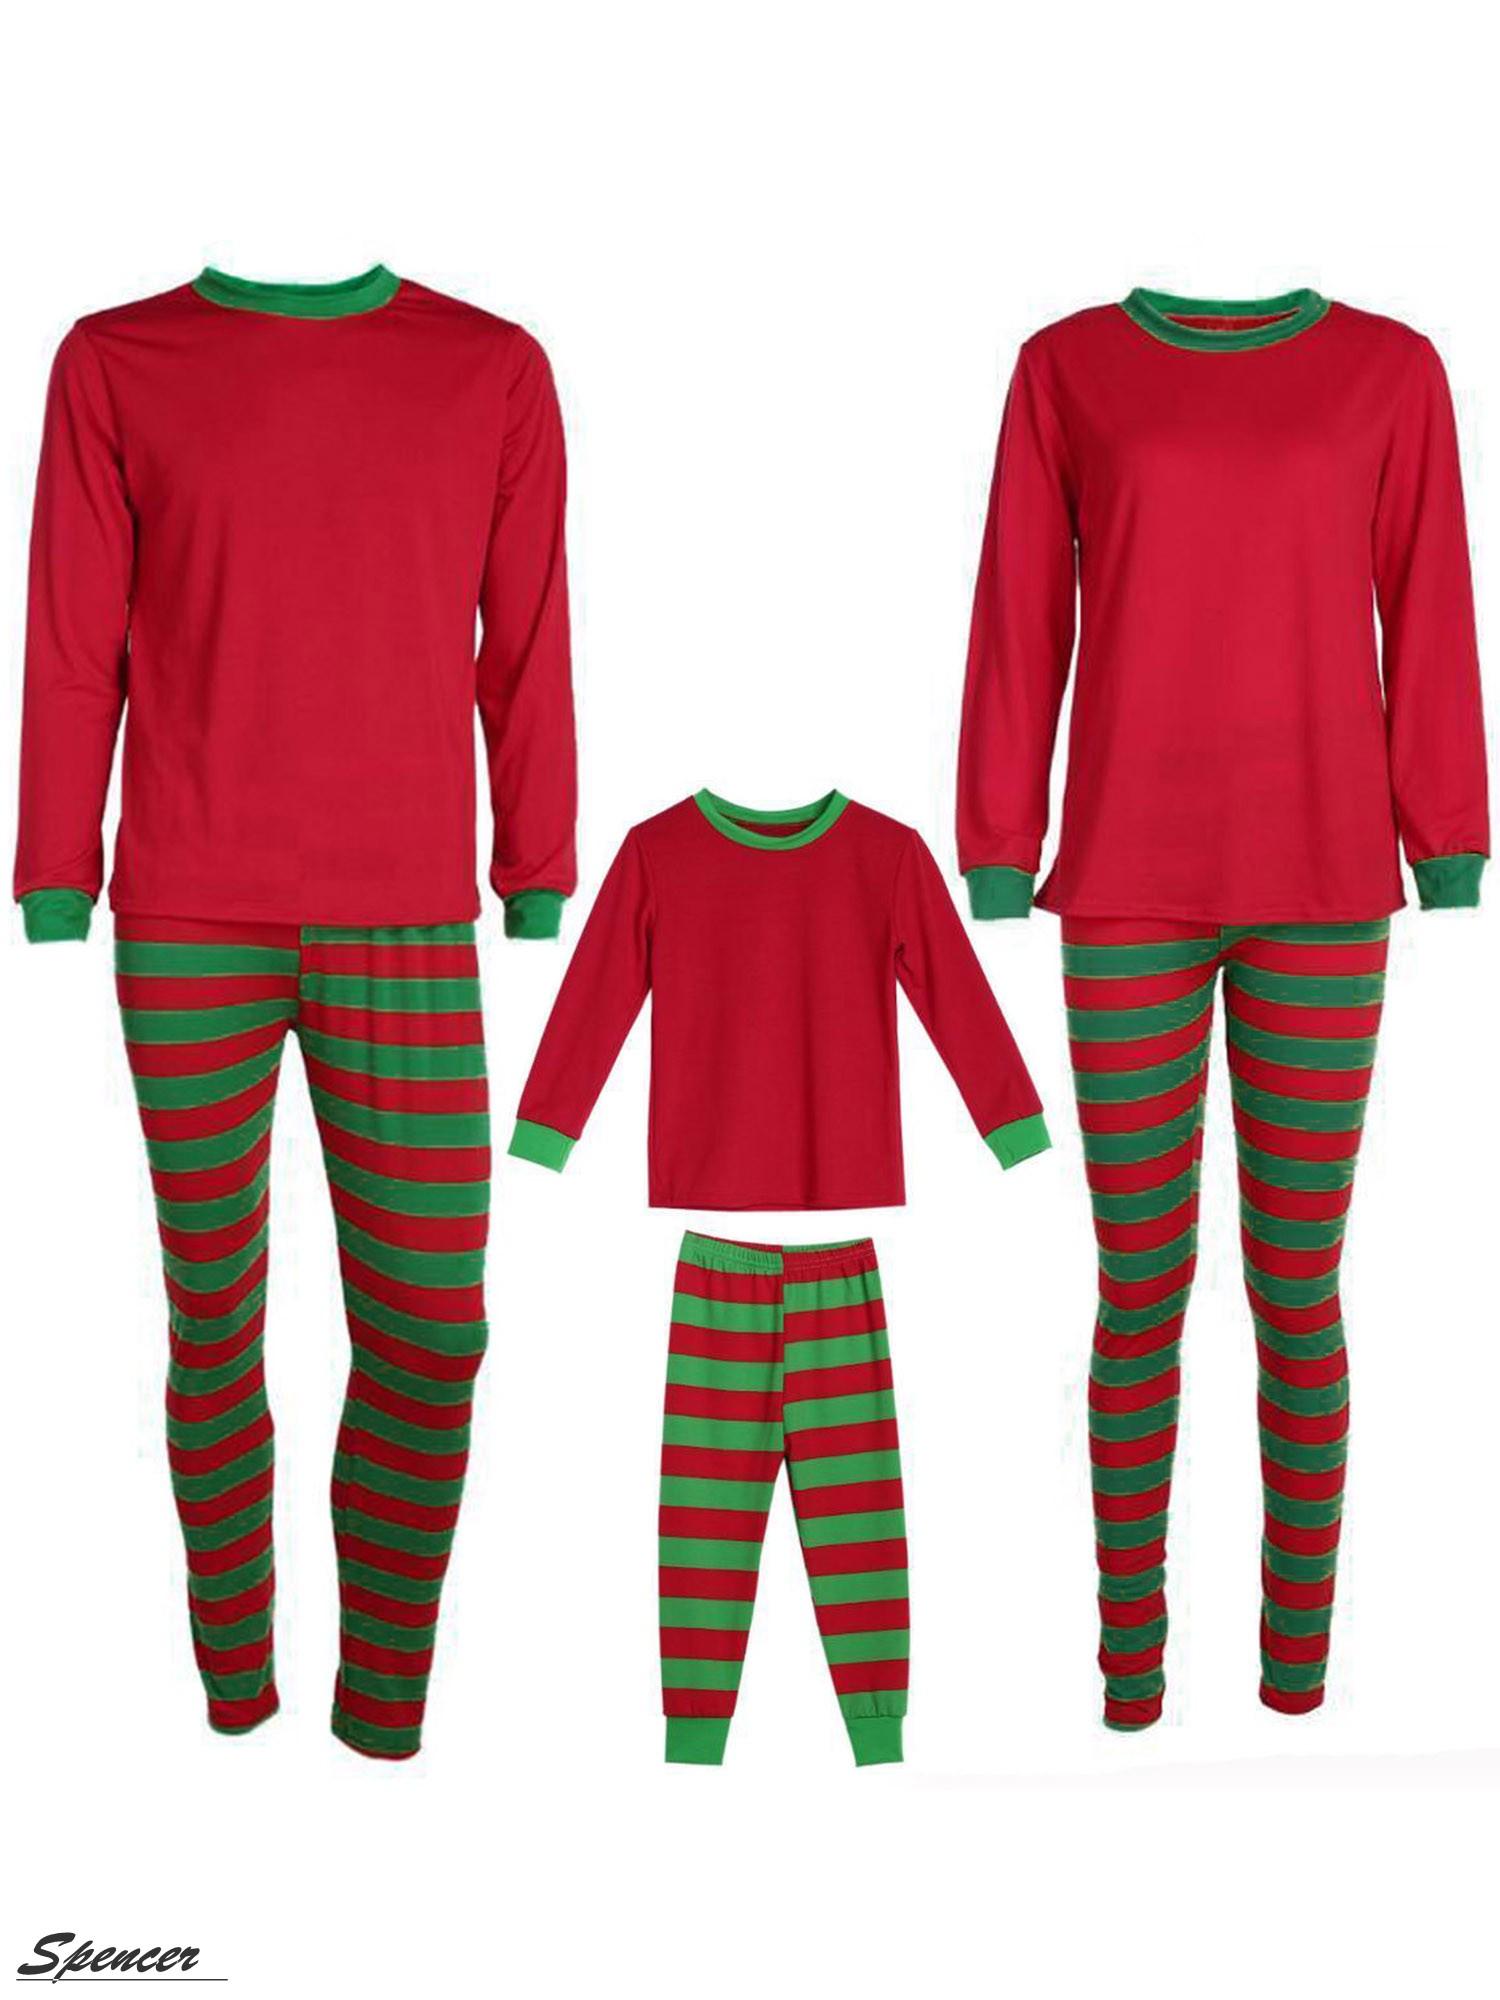 Spencer 2Pcs Family Christmas Pajamas Set Striped Long Sleeve Pants Nightwear Sleepwear Set for Dad Mom Kids